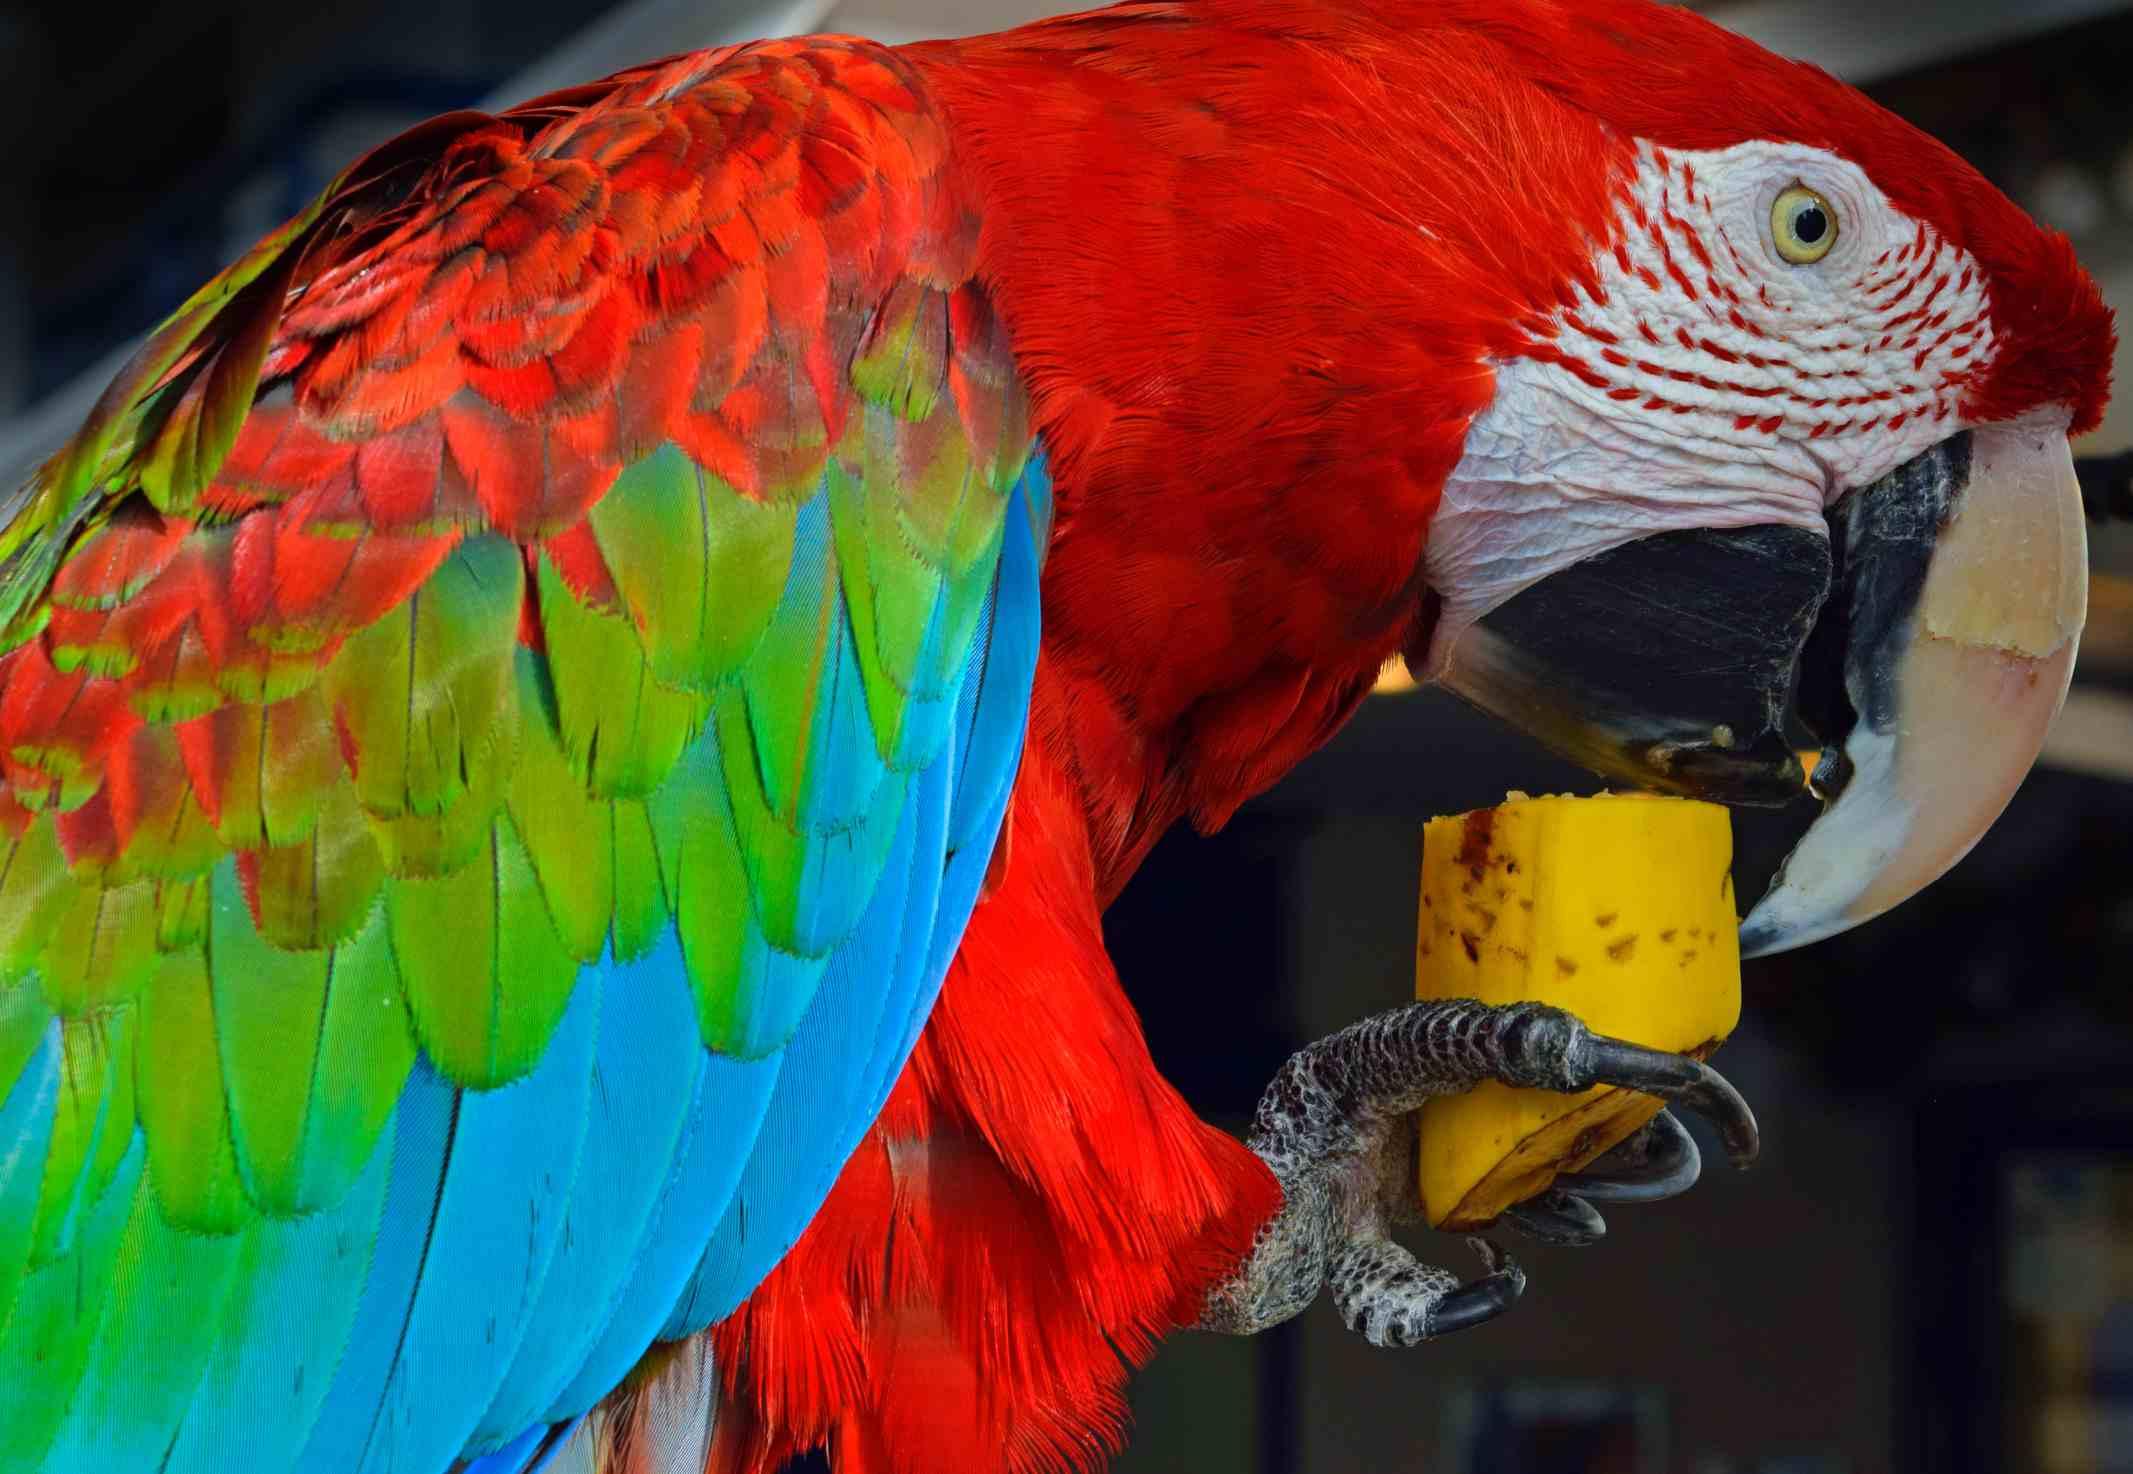 Macaw eating banana